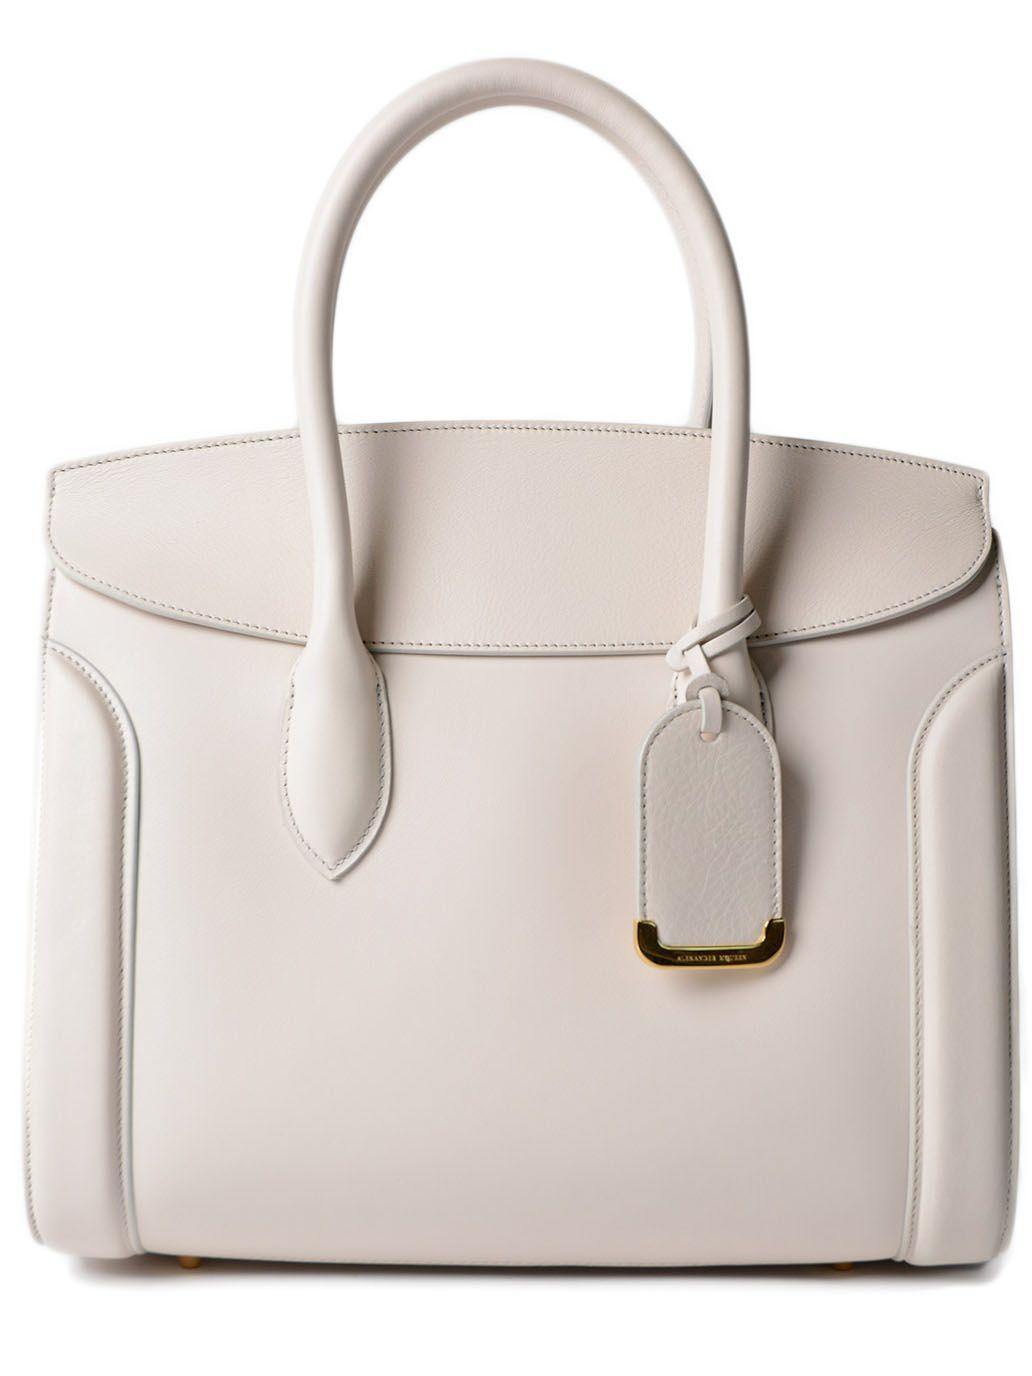 Alexander McQueen Shoulder Strap Bag